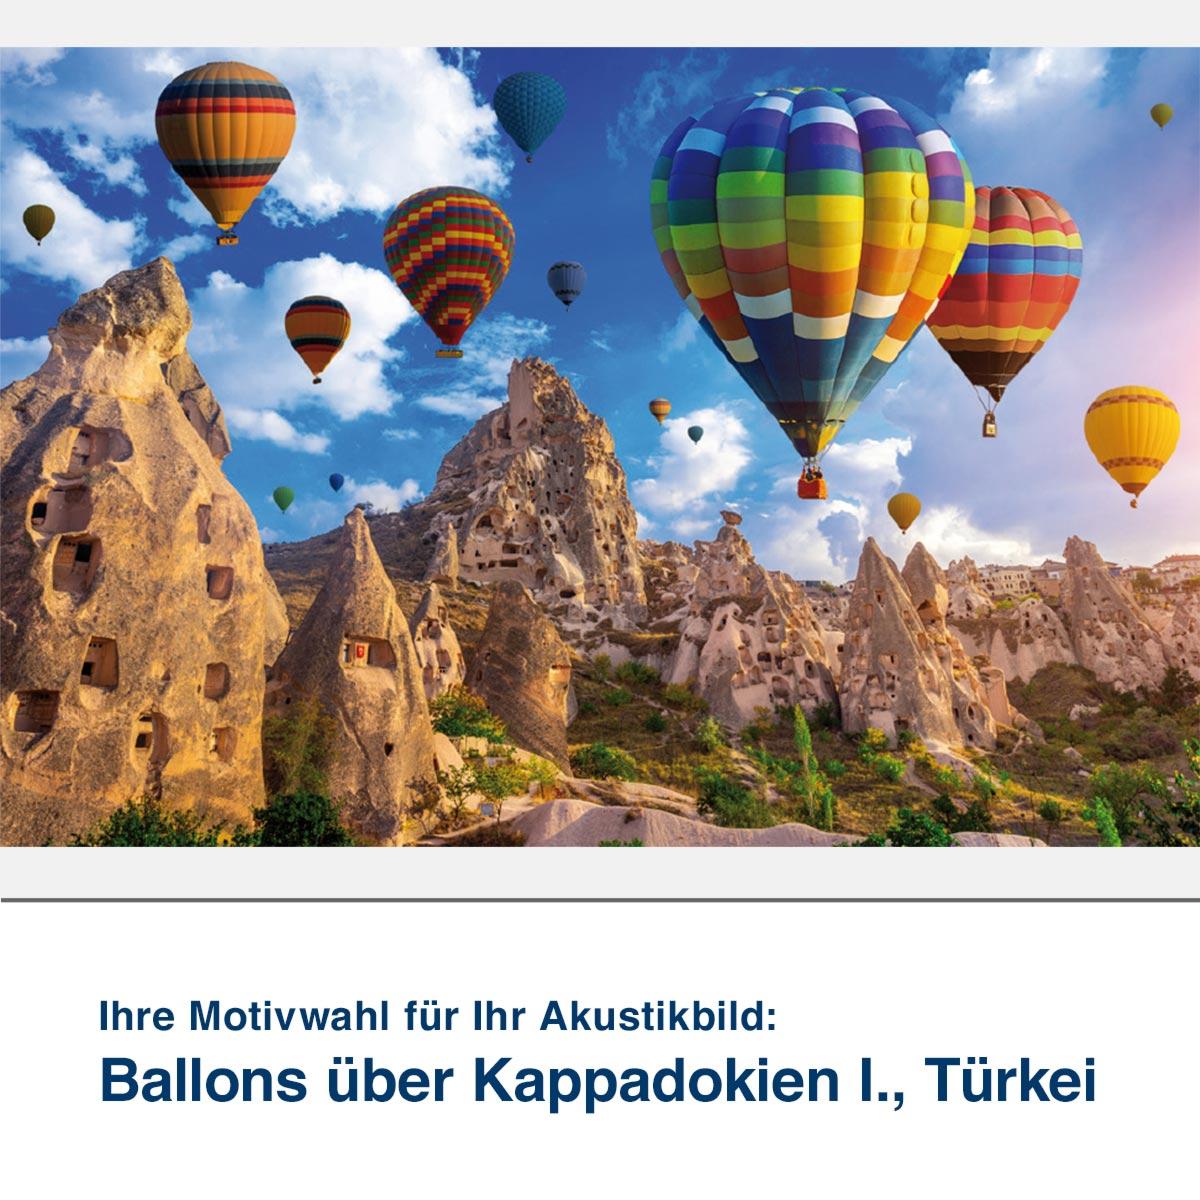 Akustikbild Motiv Ballons über Kappadokien I., Türkei